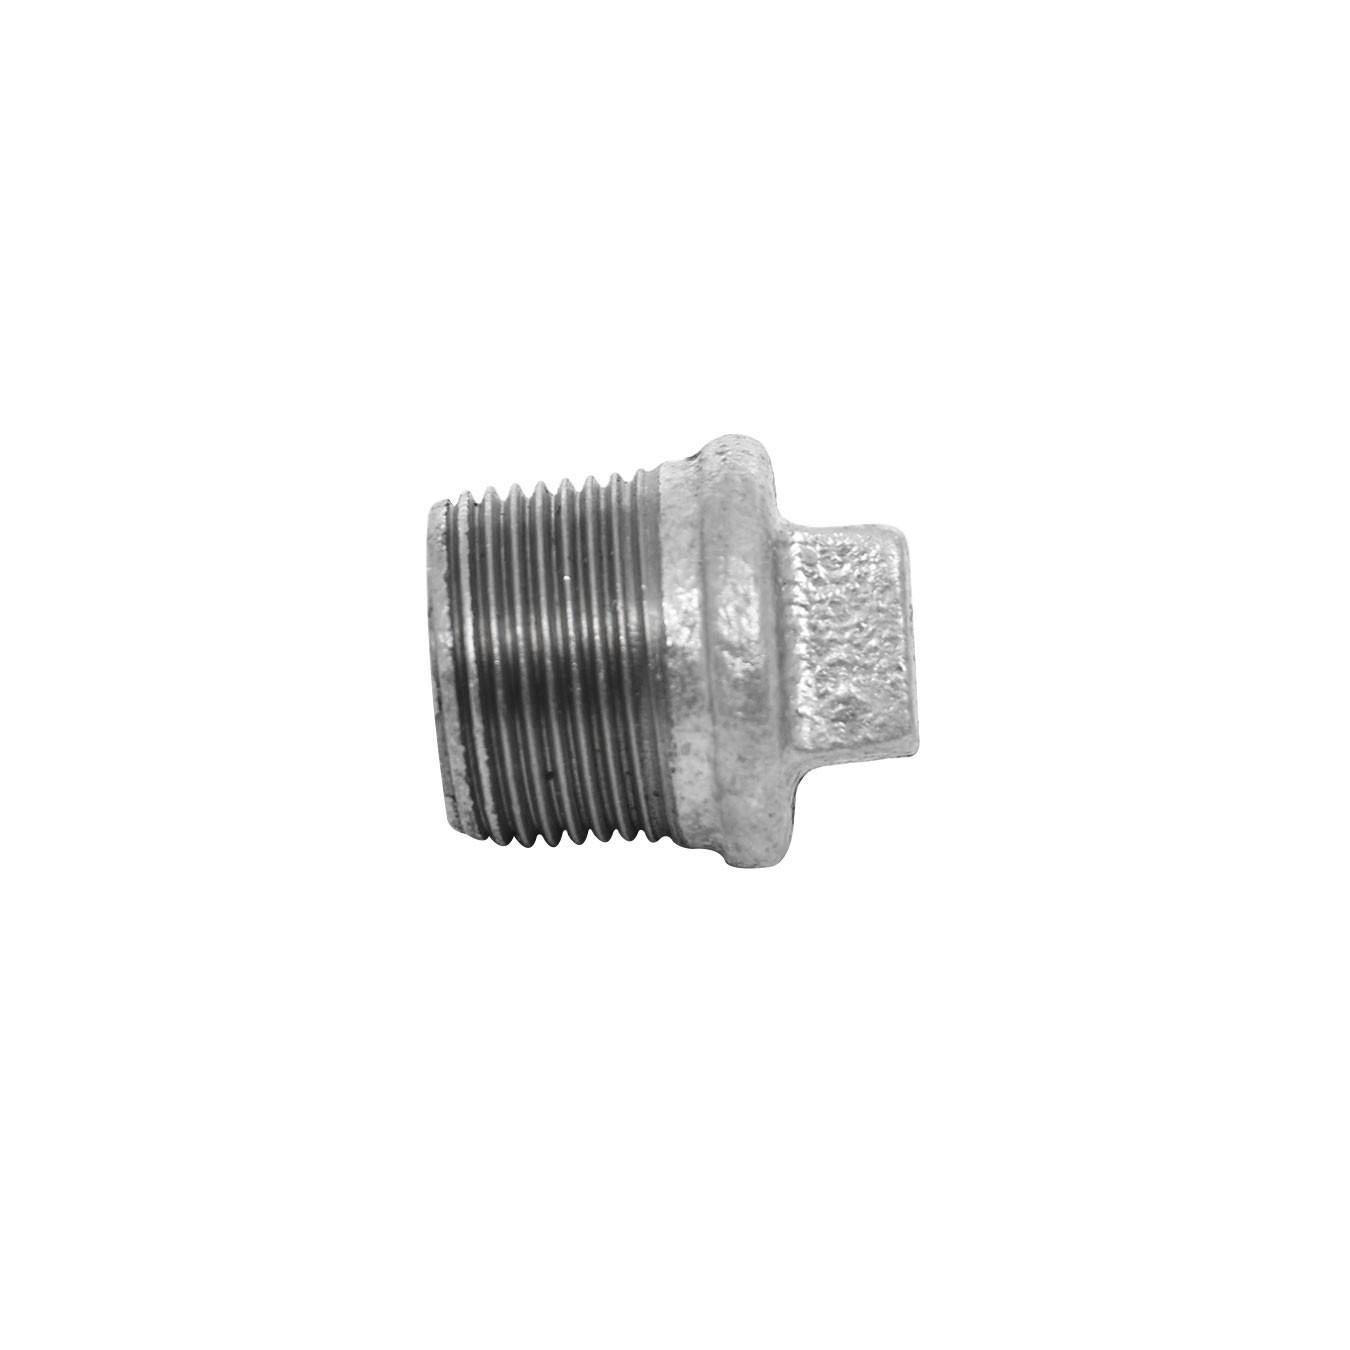 Dop fonta zincata 290, 3/4 inch